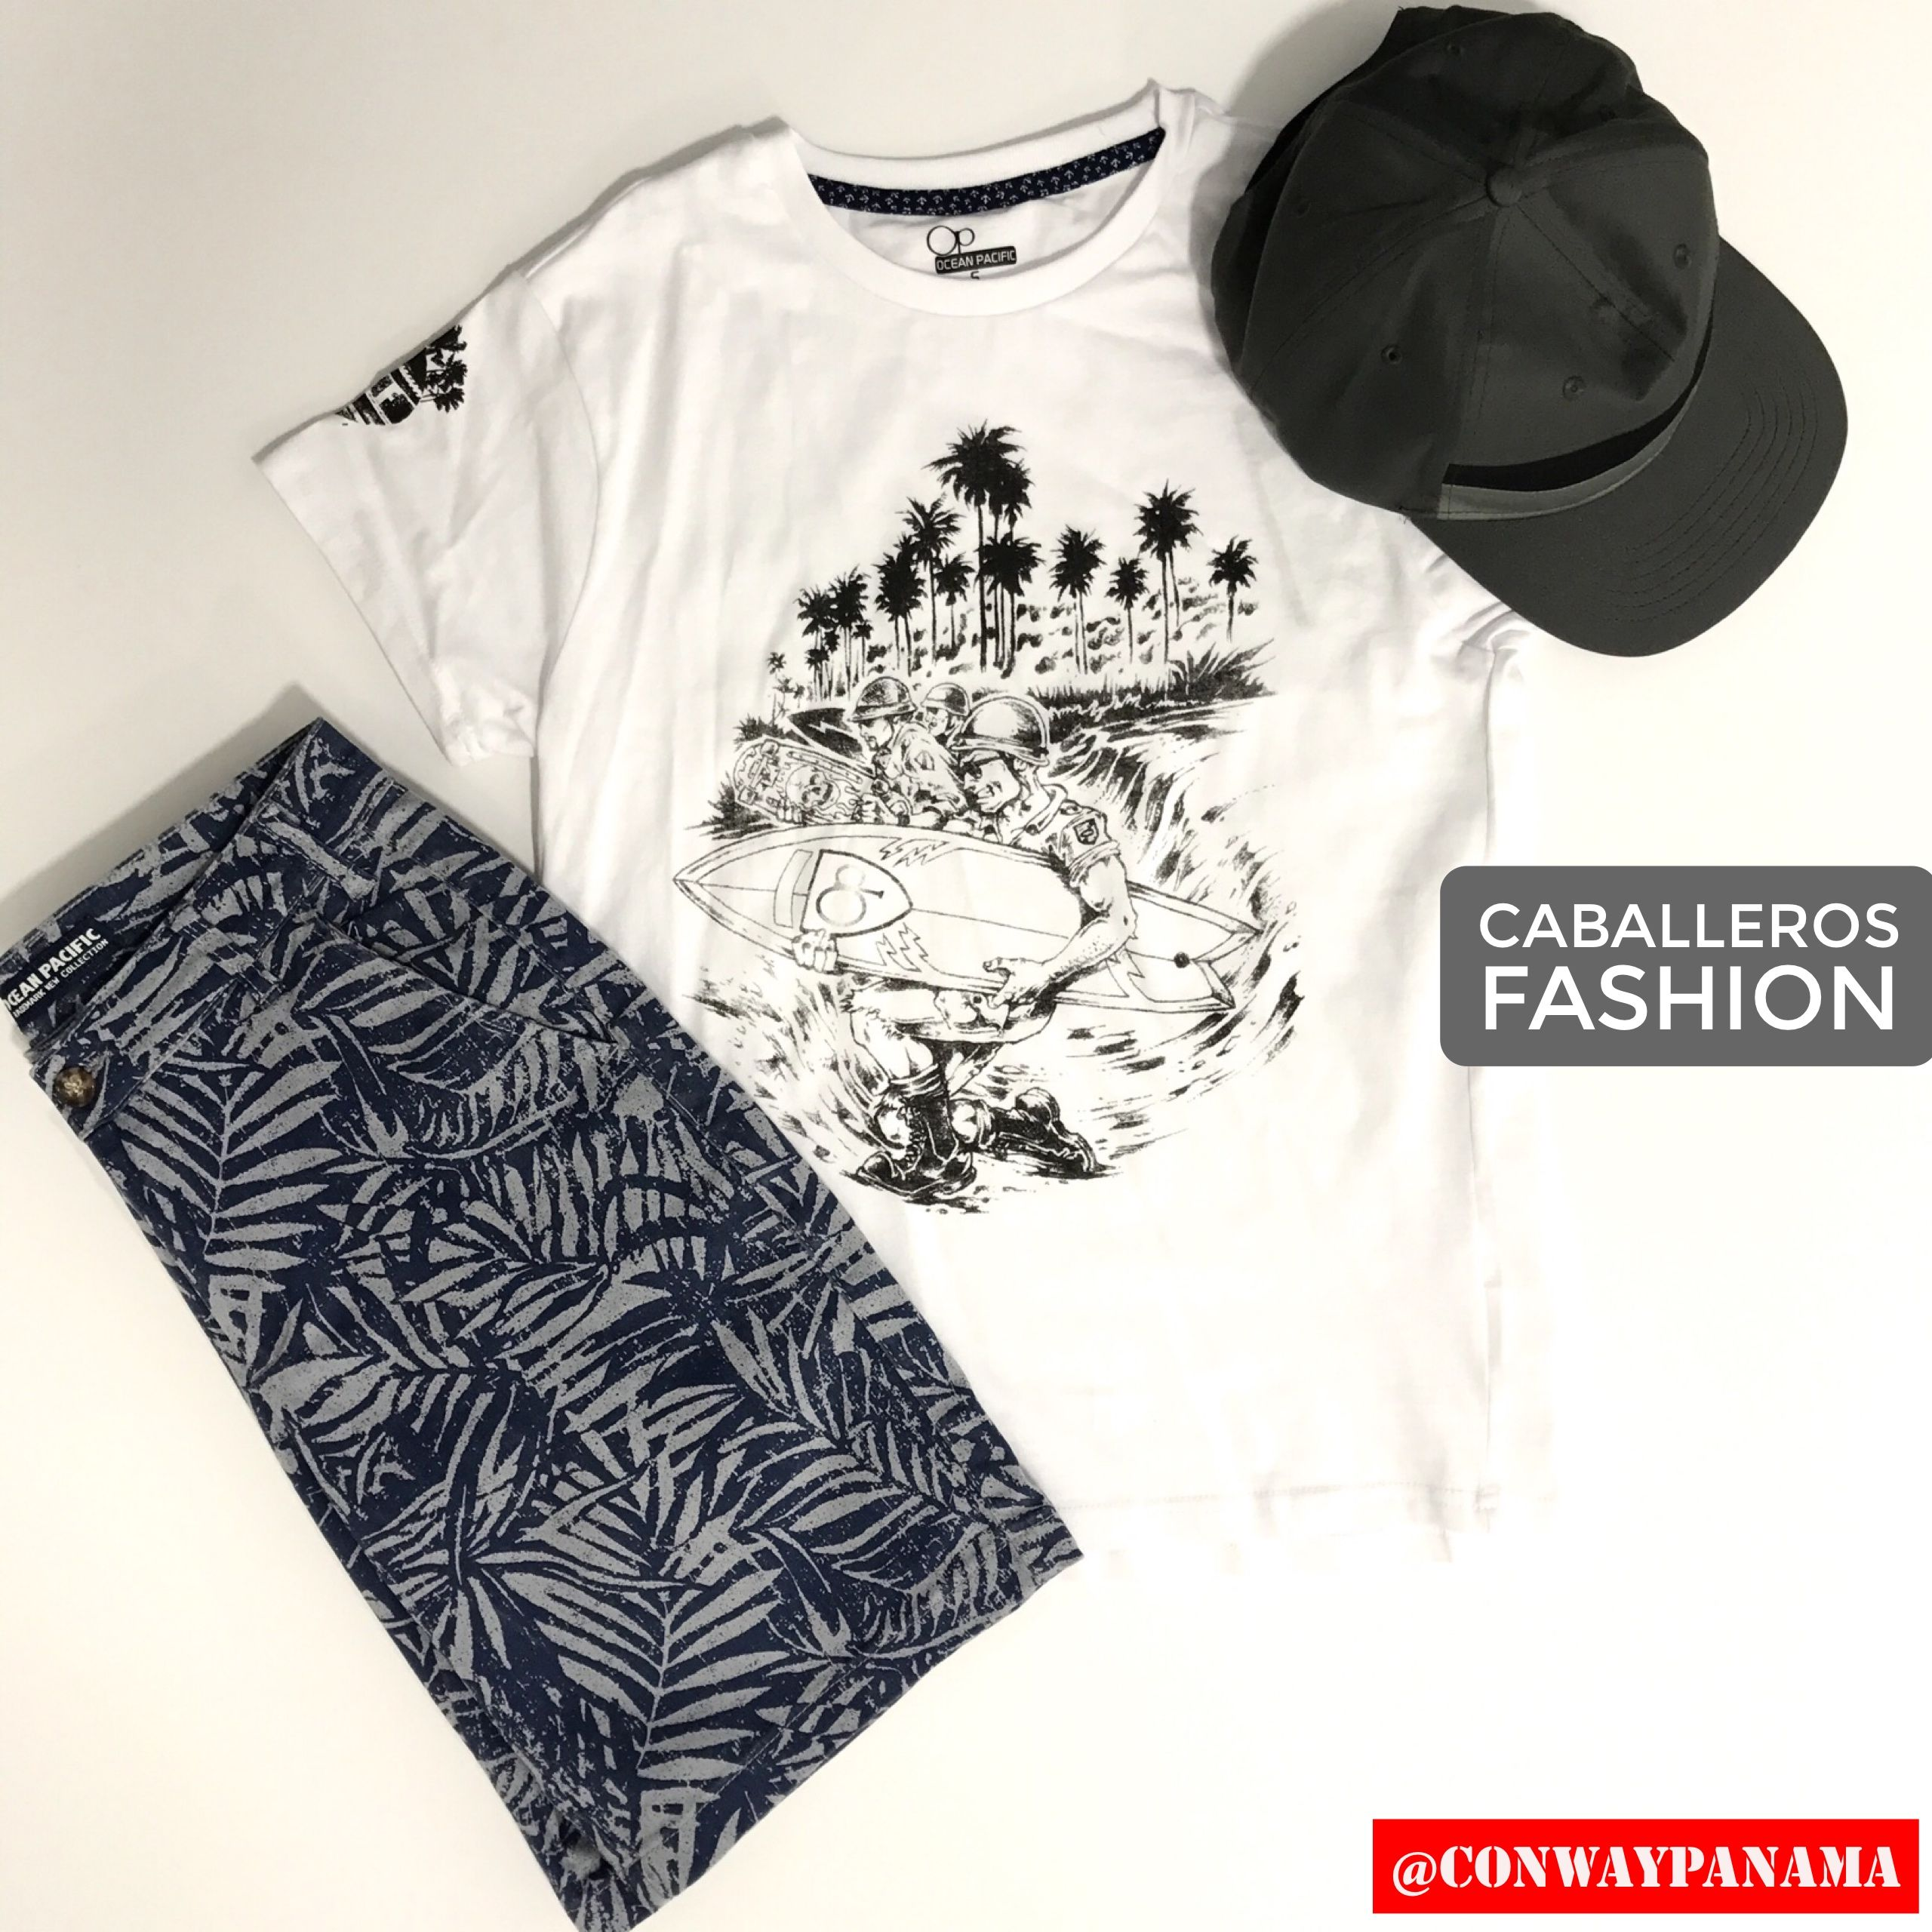 #SigueAConway #Fashion #Moda #Panama